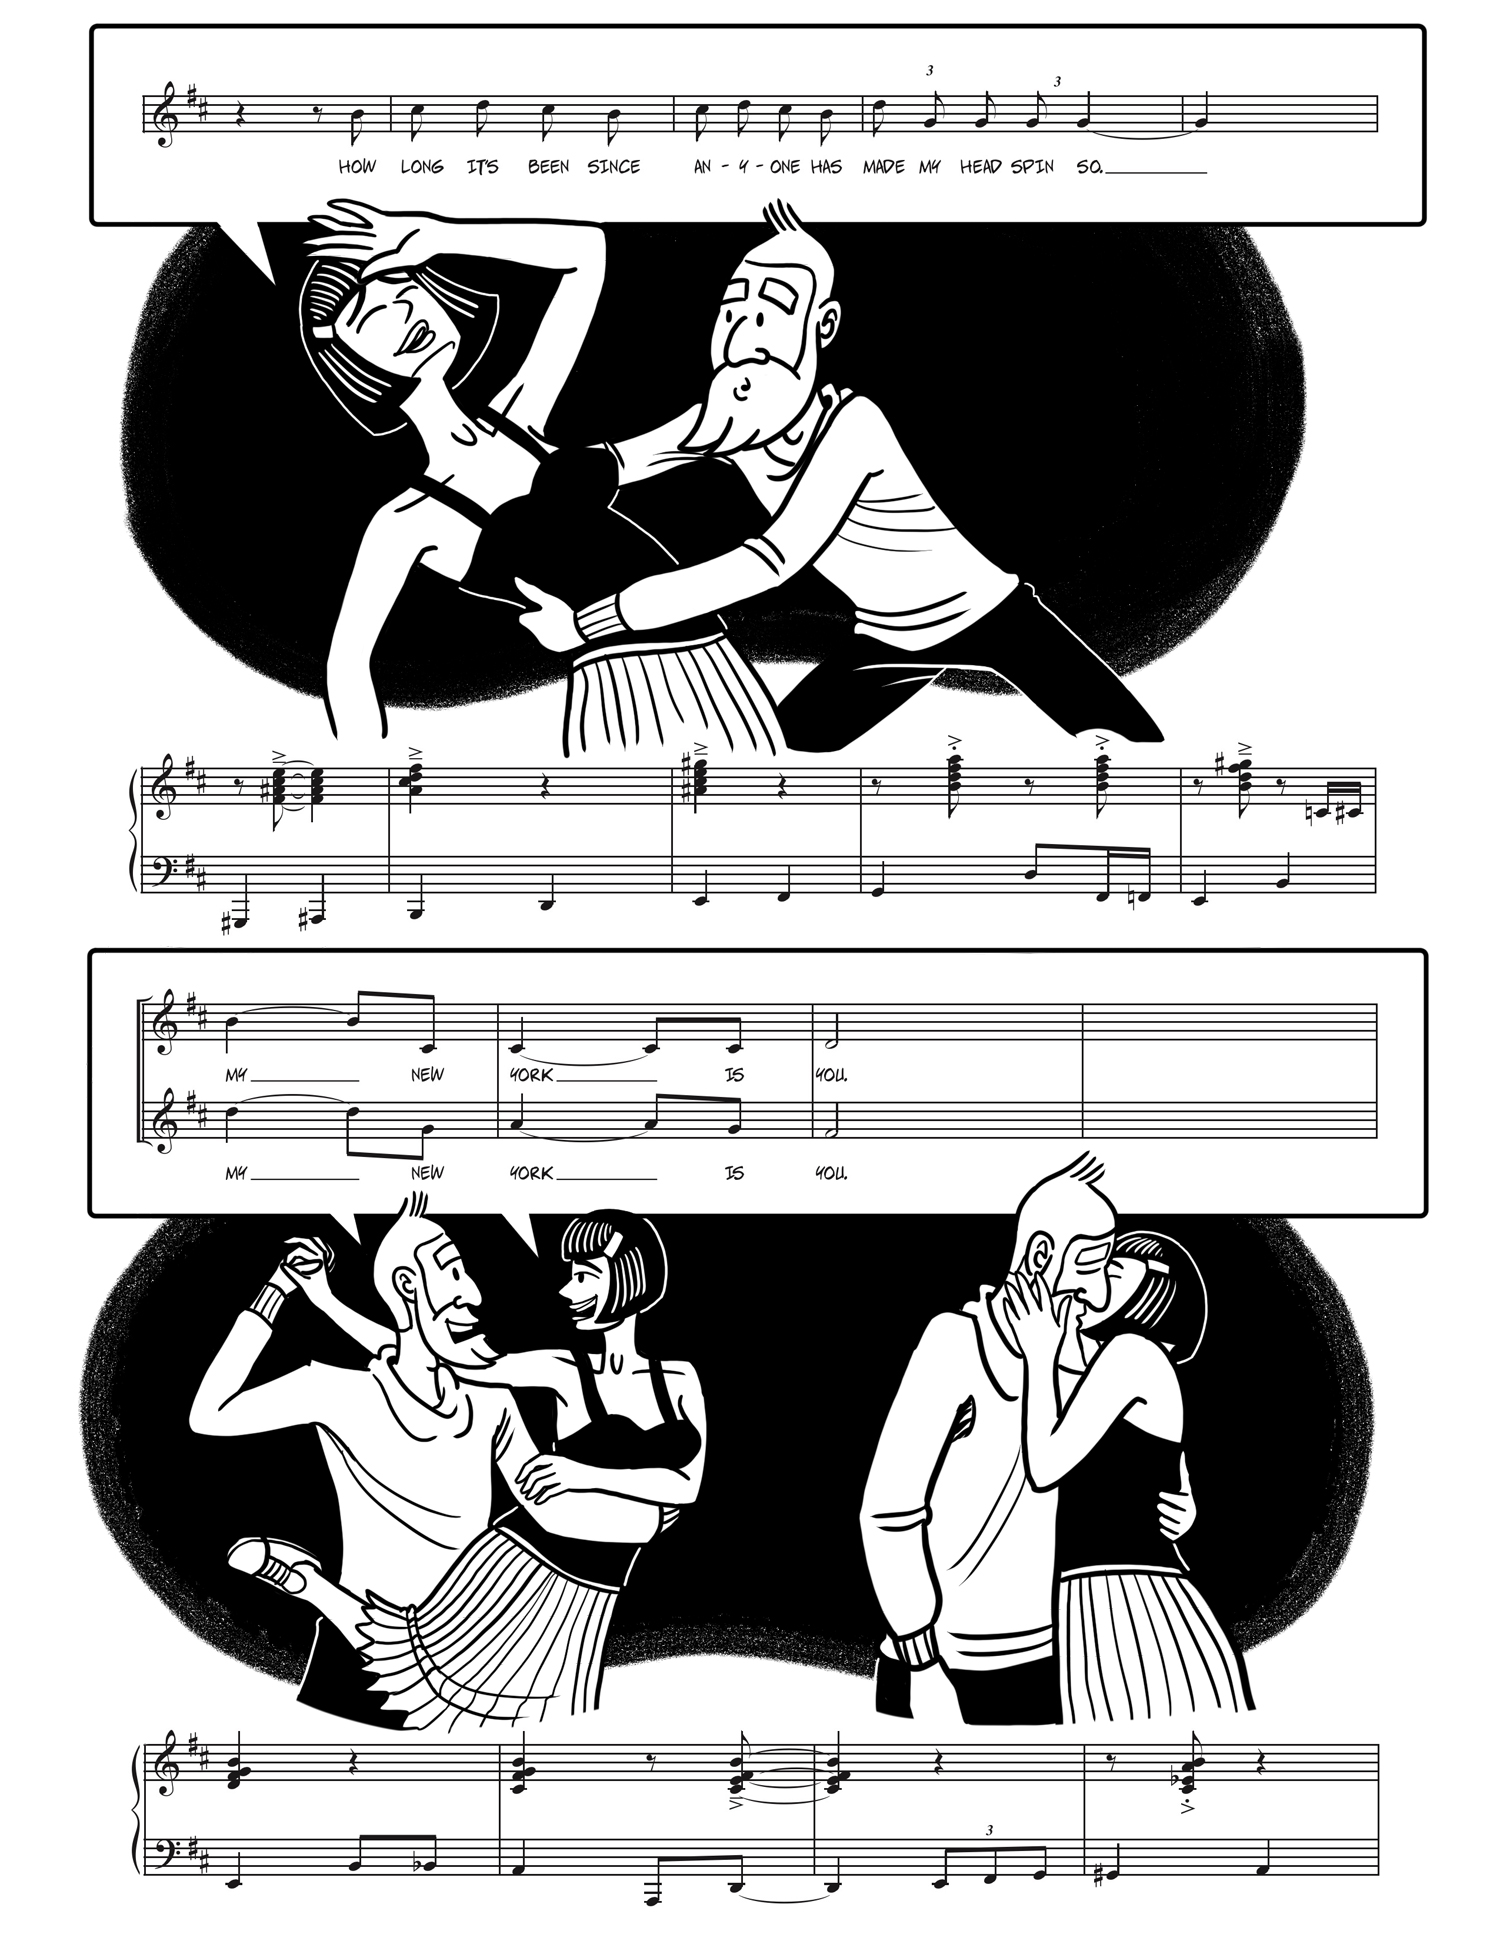 PAGE-361.jpg